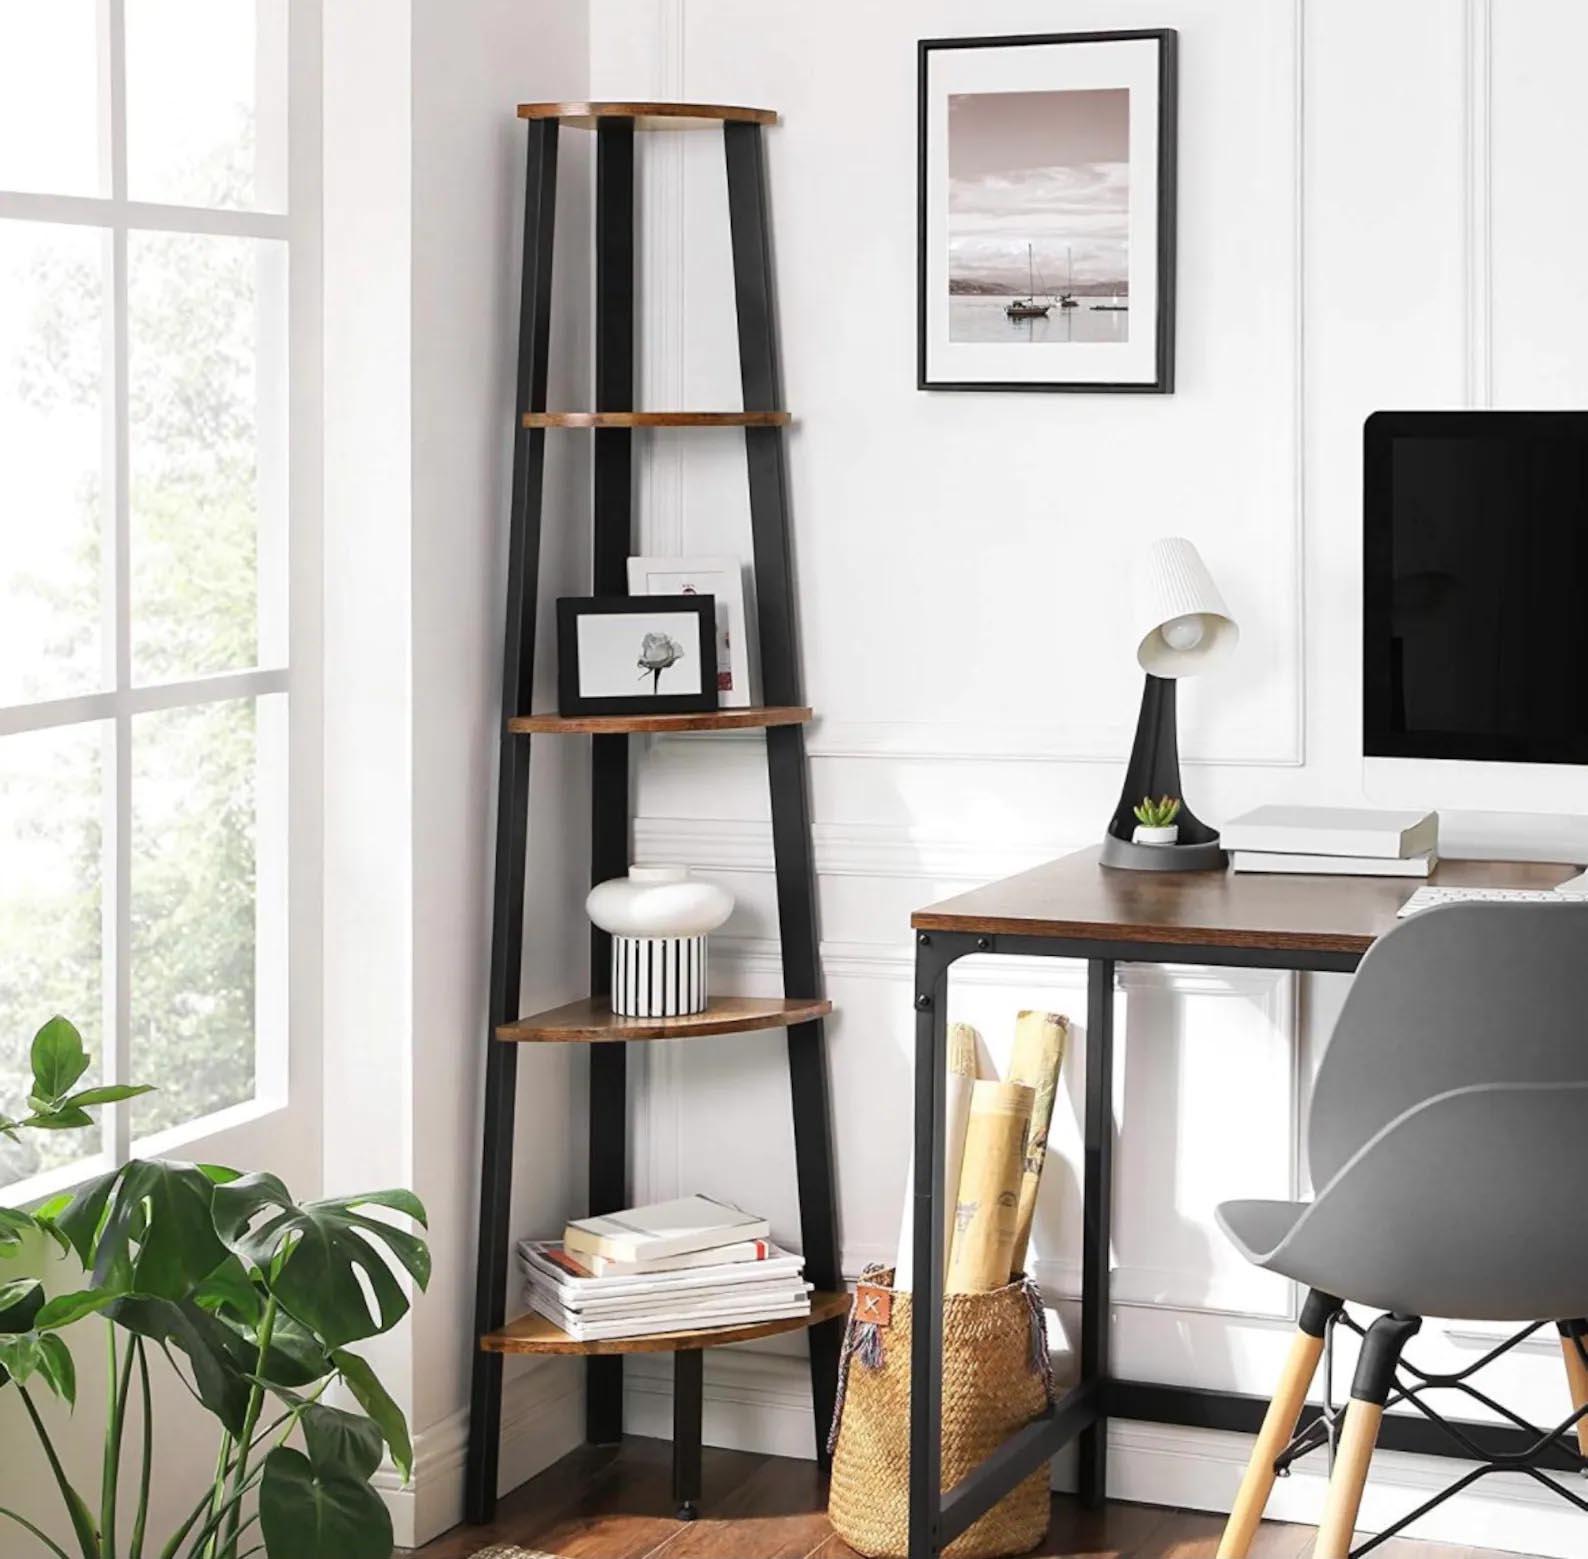 Corner Shelf Ideas - A black and wood freestanding corner shelf.